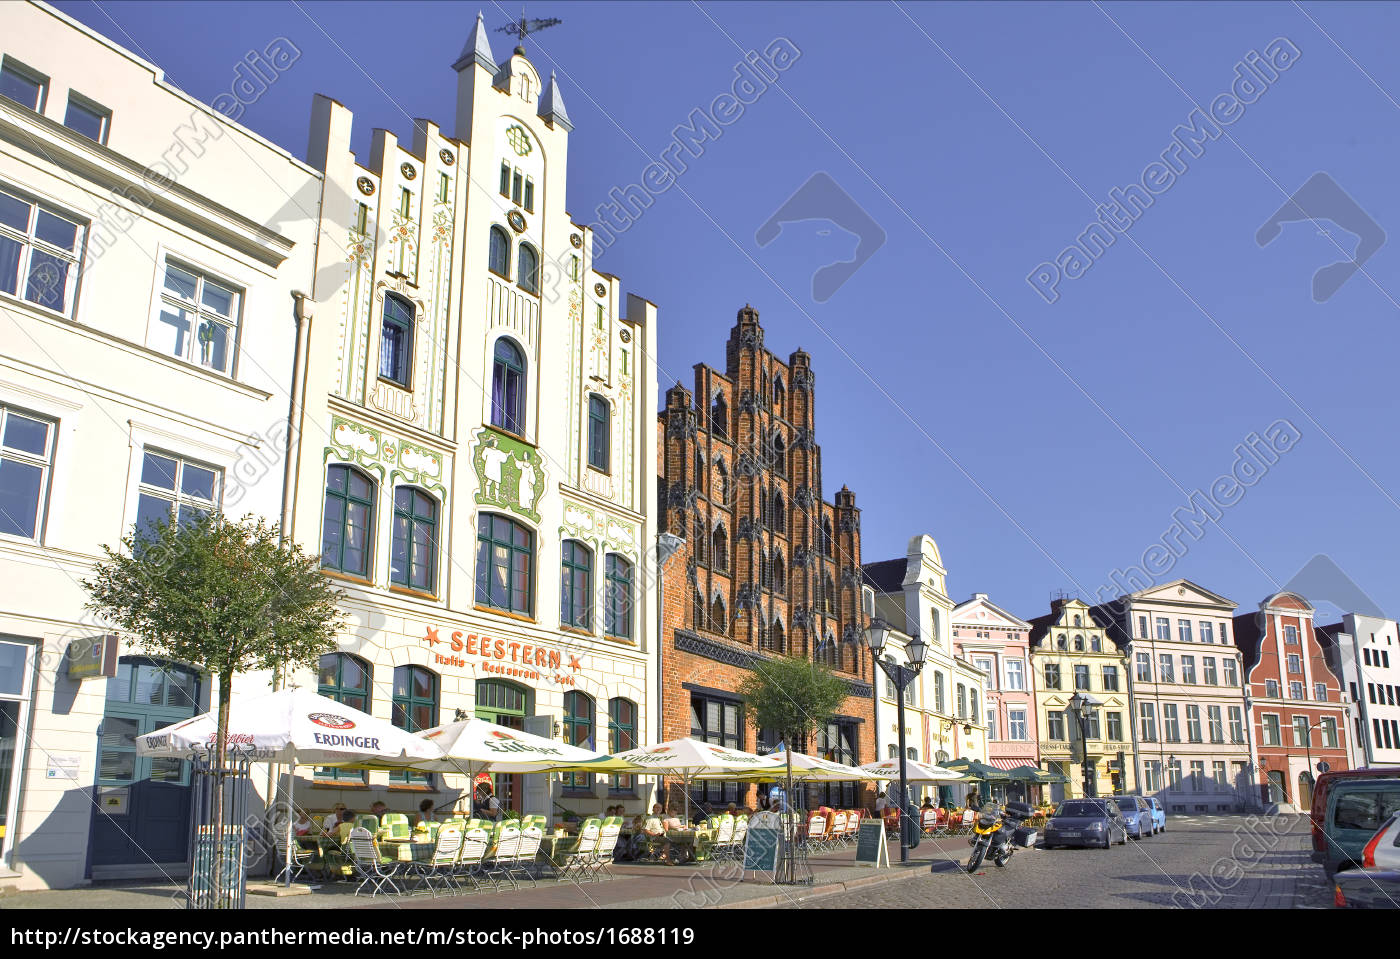 wismar, -, market, place - 1688119